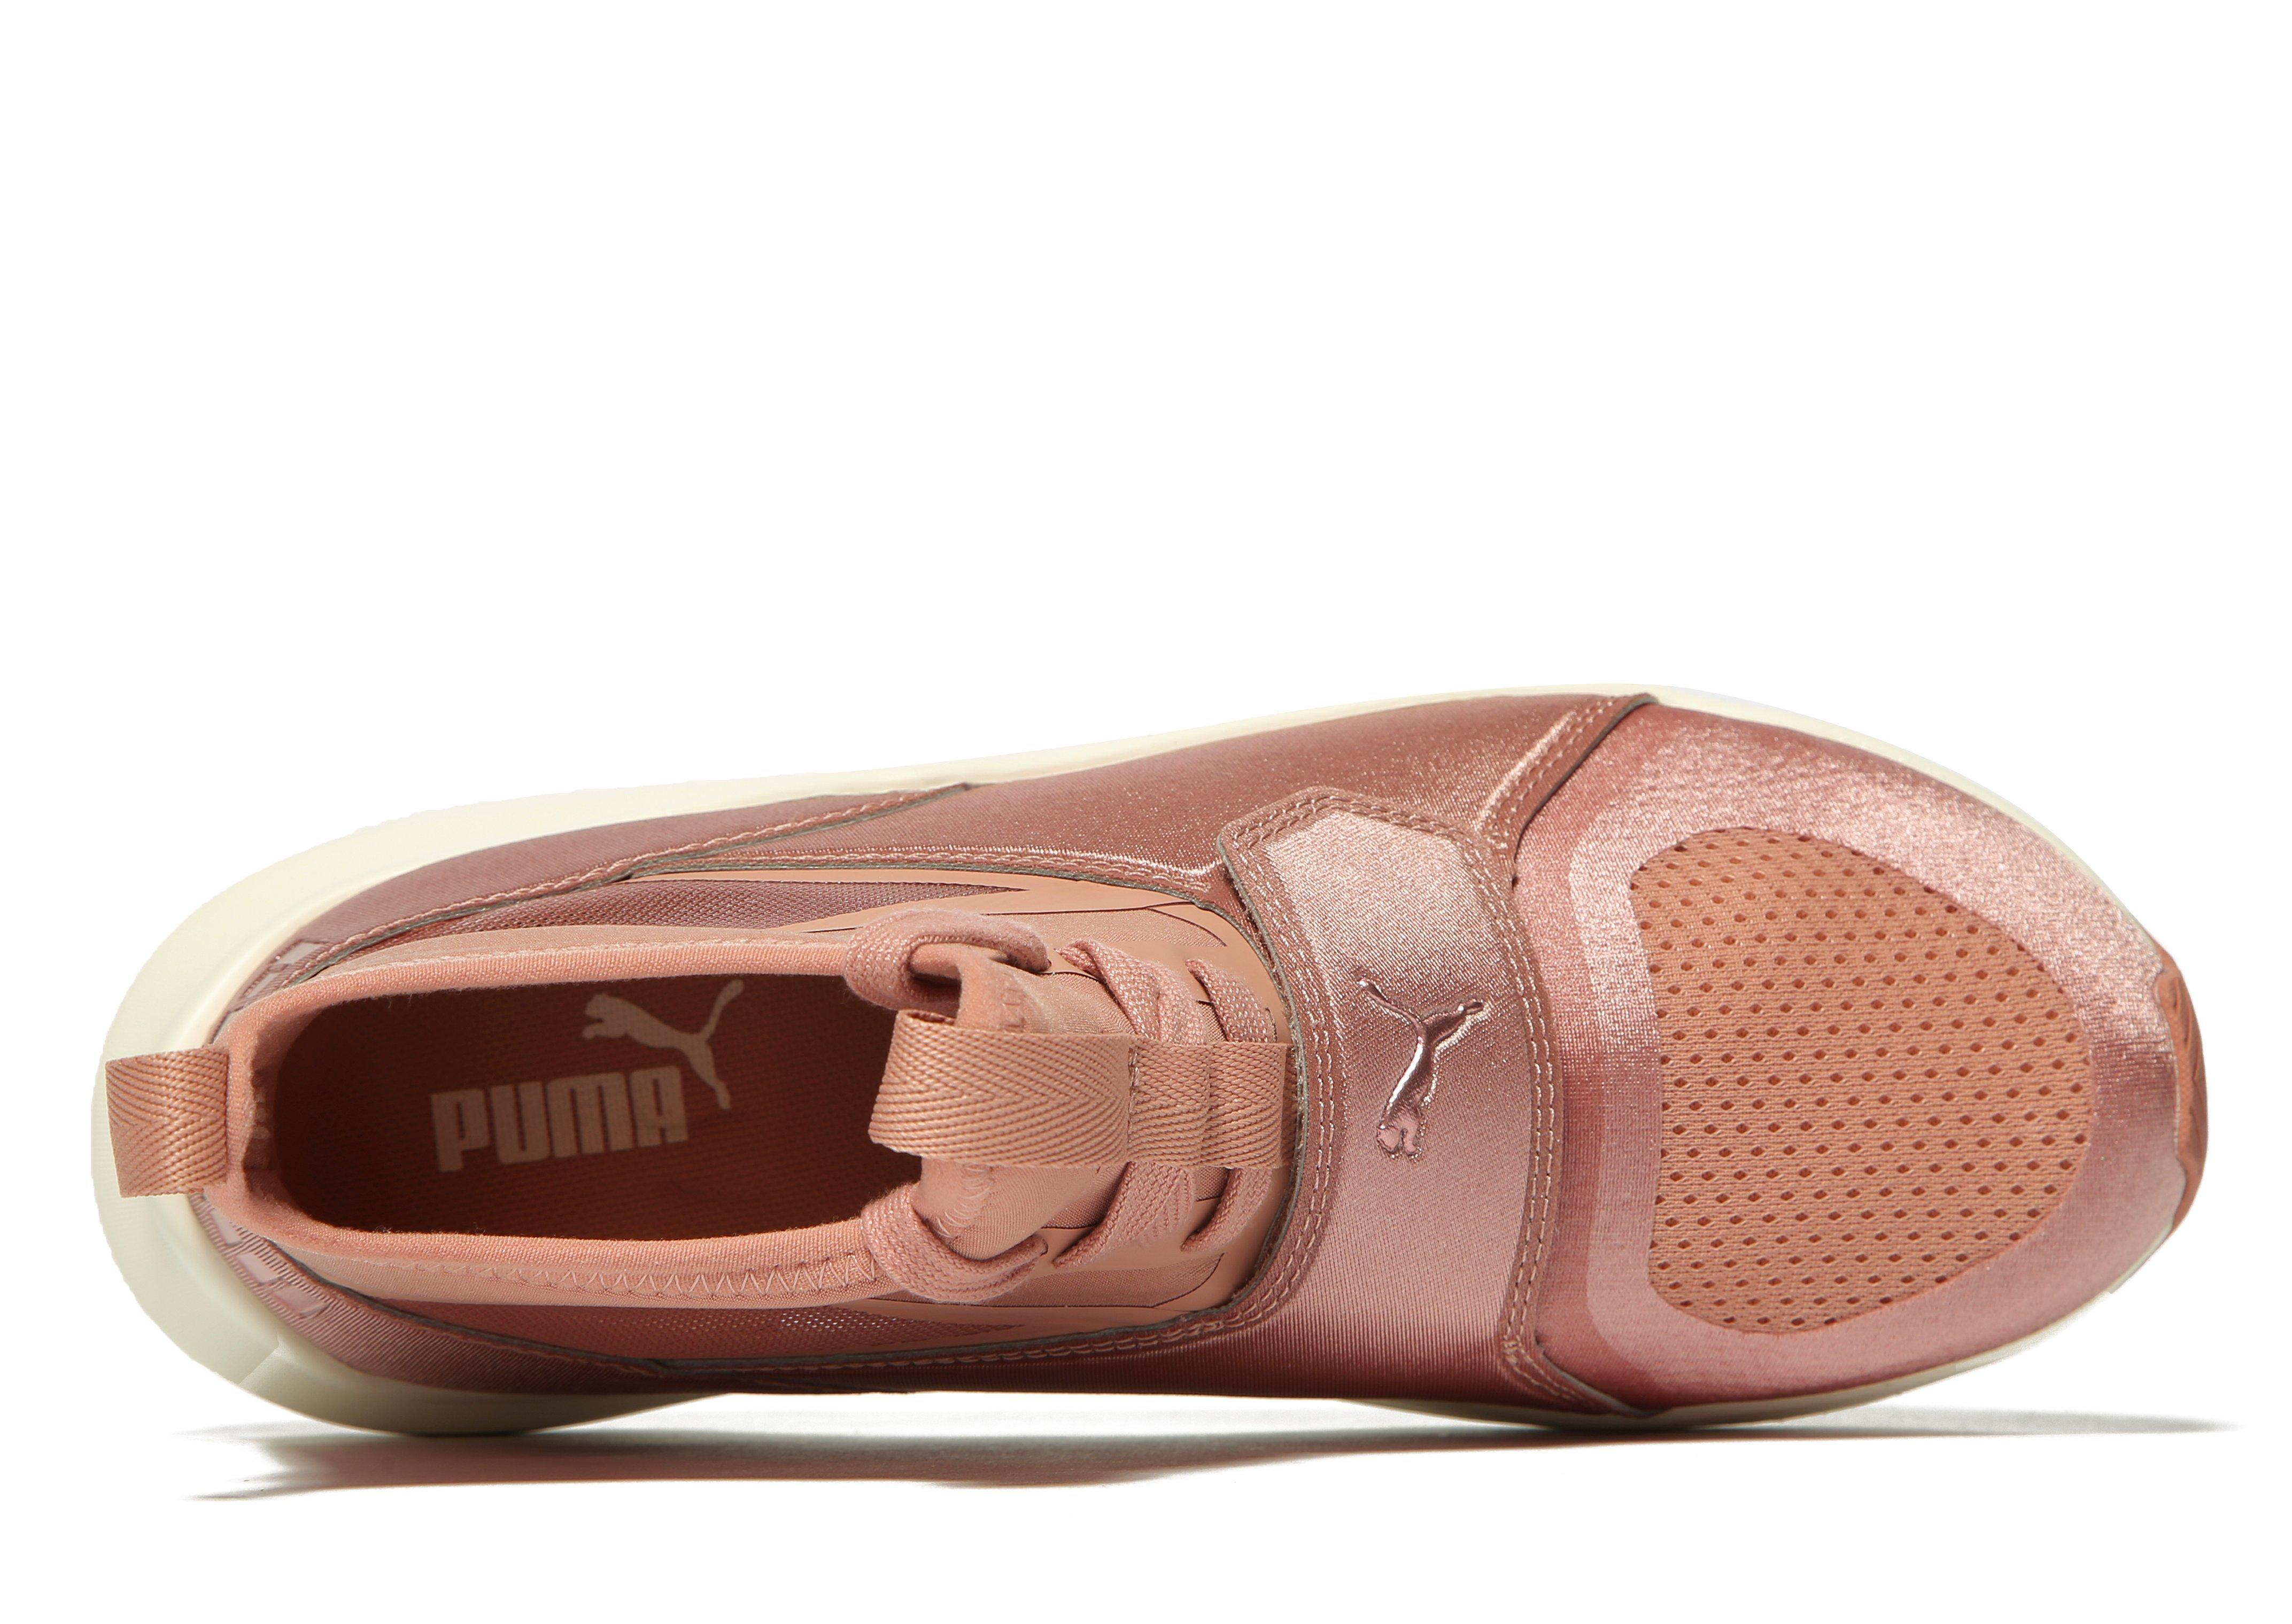 Lyst - Puma Phenom in Pink 14960ca38